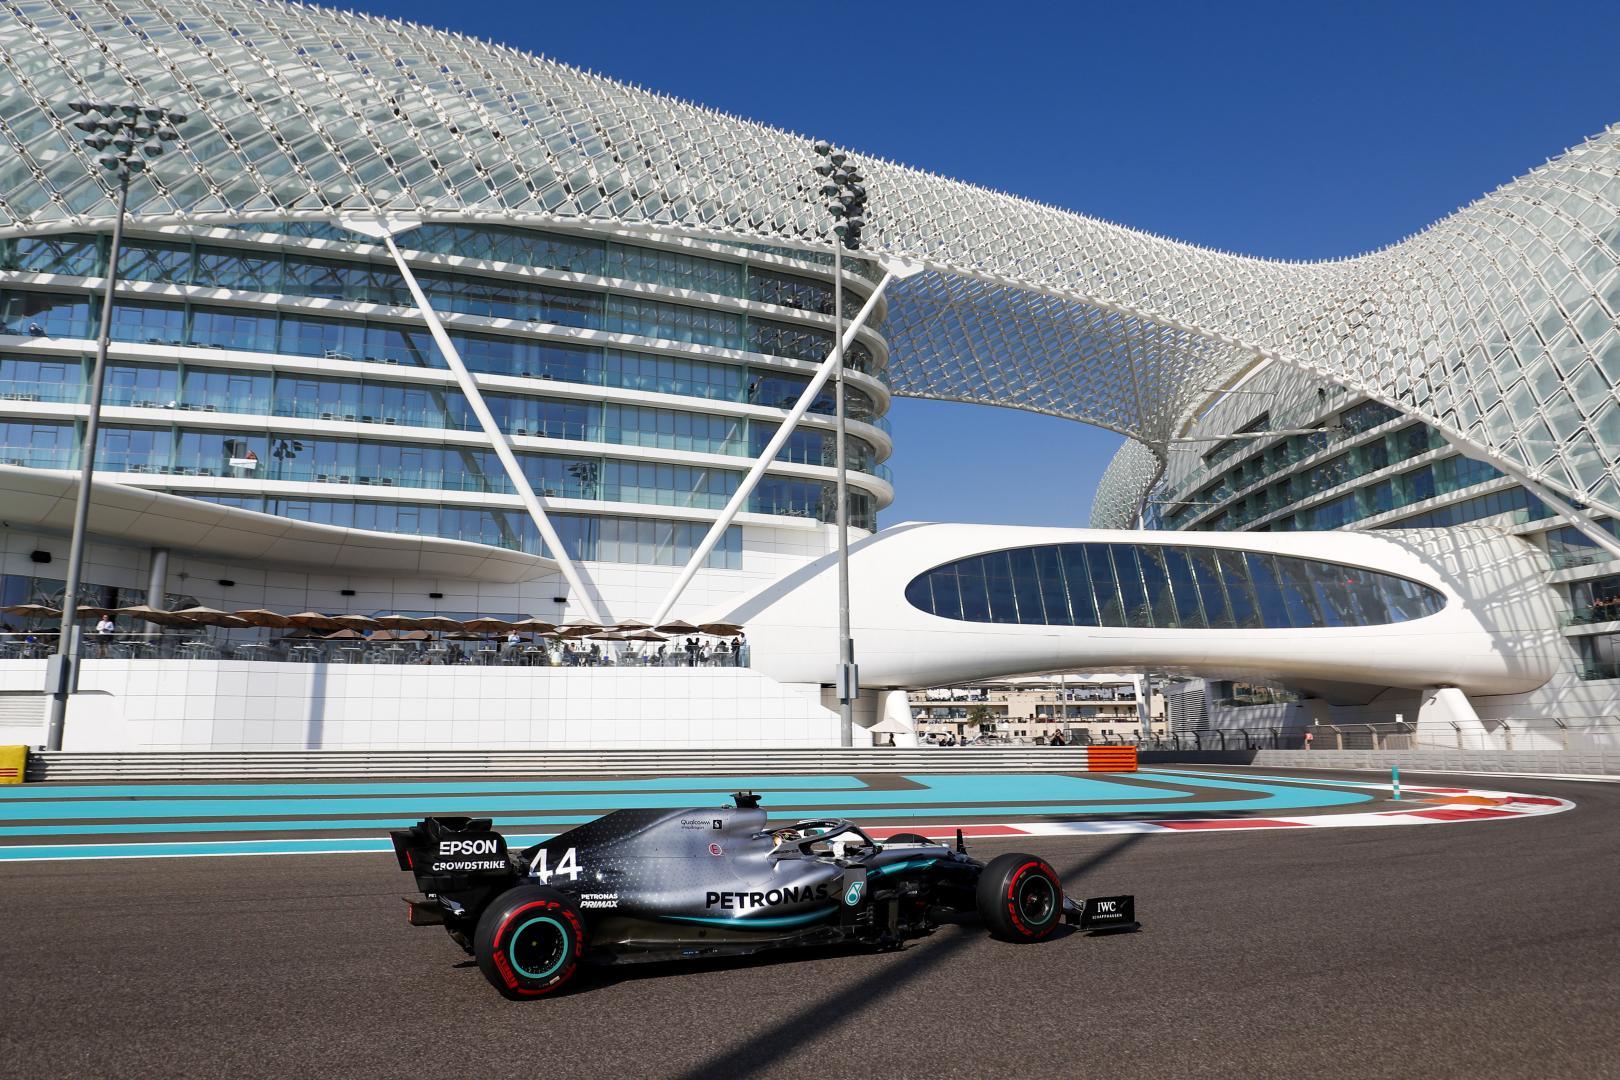 Lewis Hamilton bij hotel GP van Abu Dhabi 2019